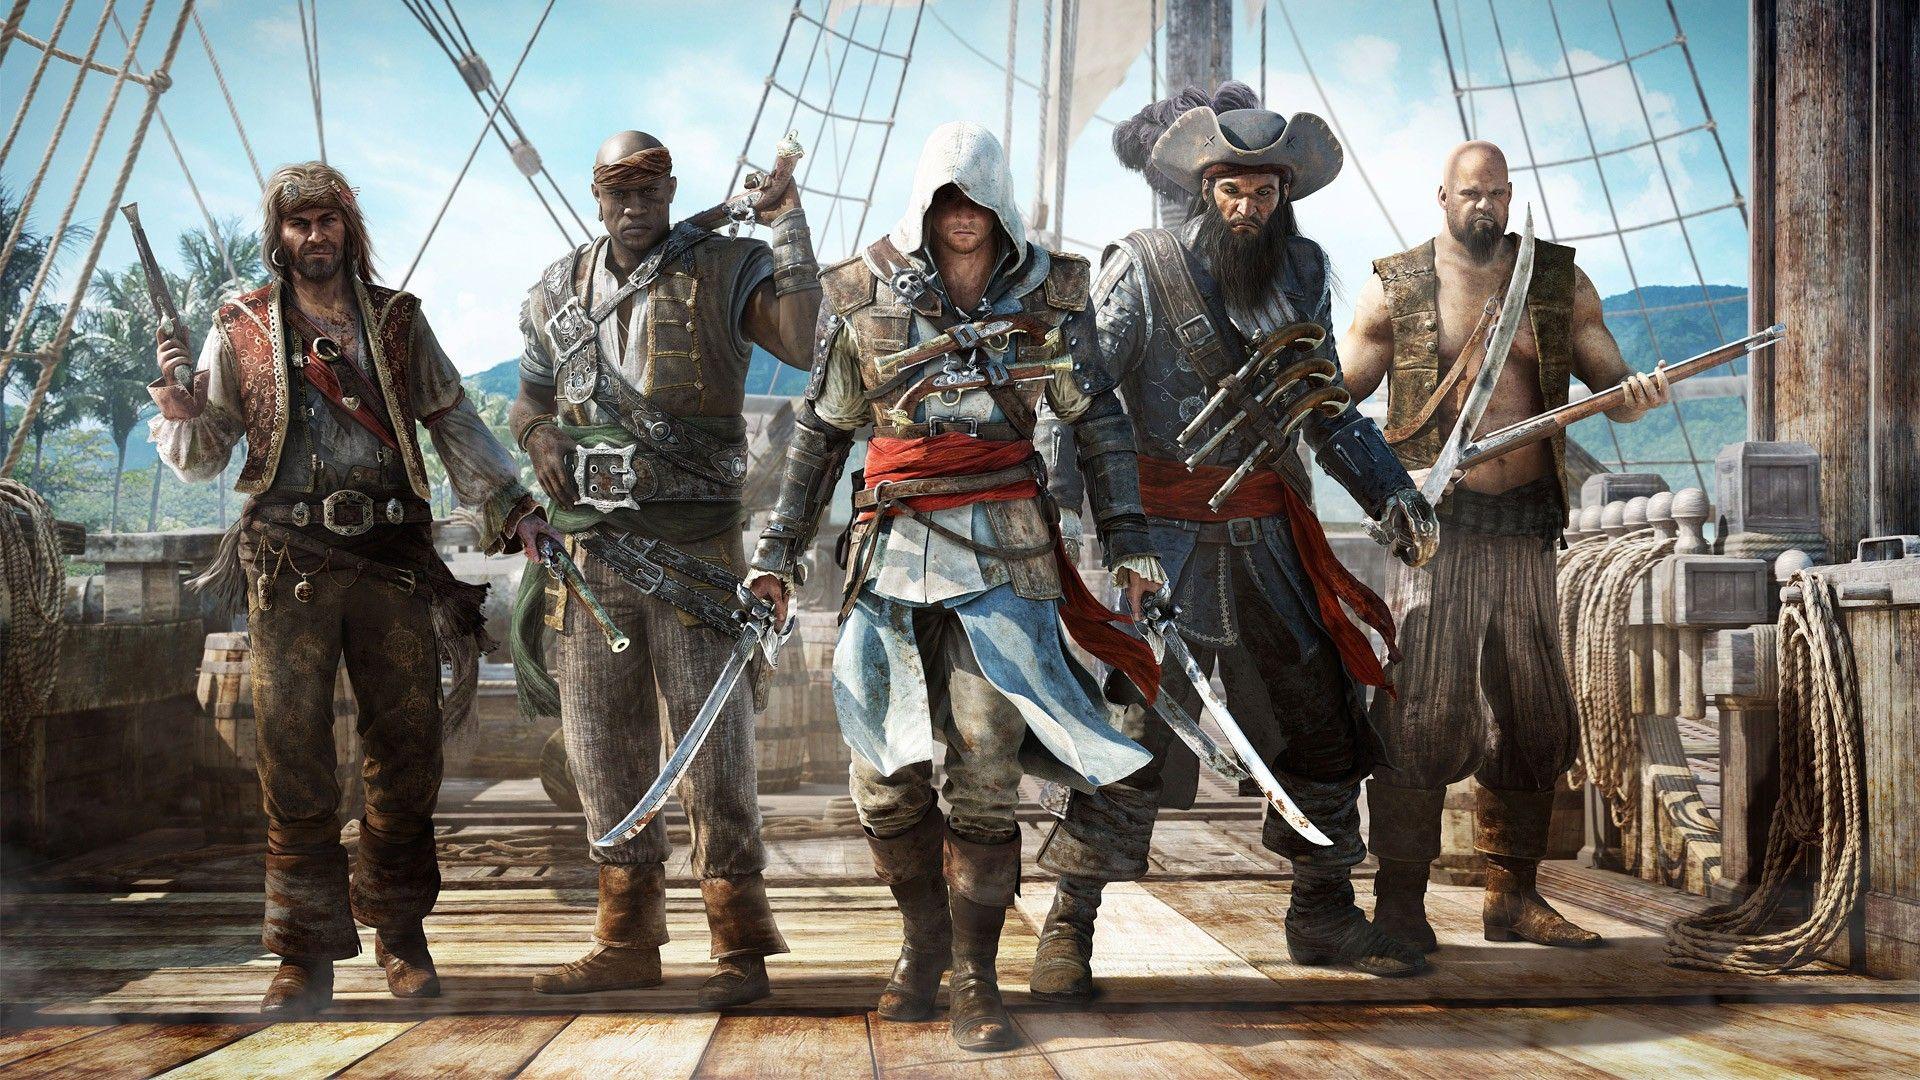 Assassins Creed 4 Black Flag Edward Kenway